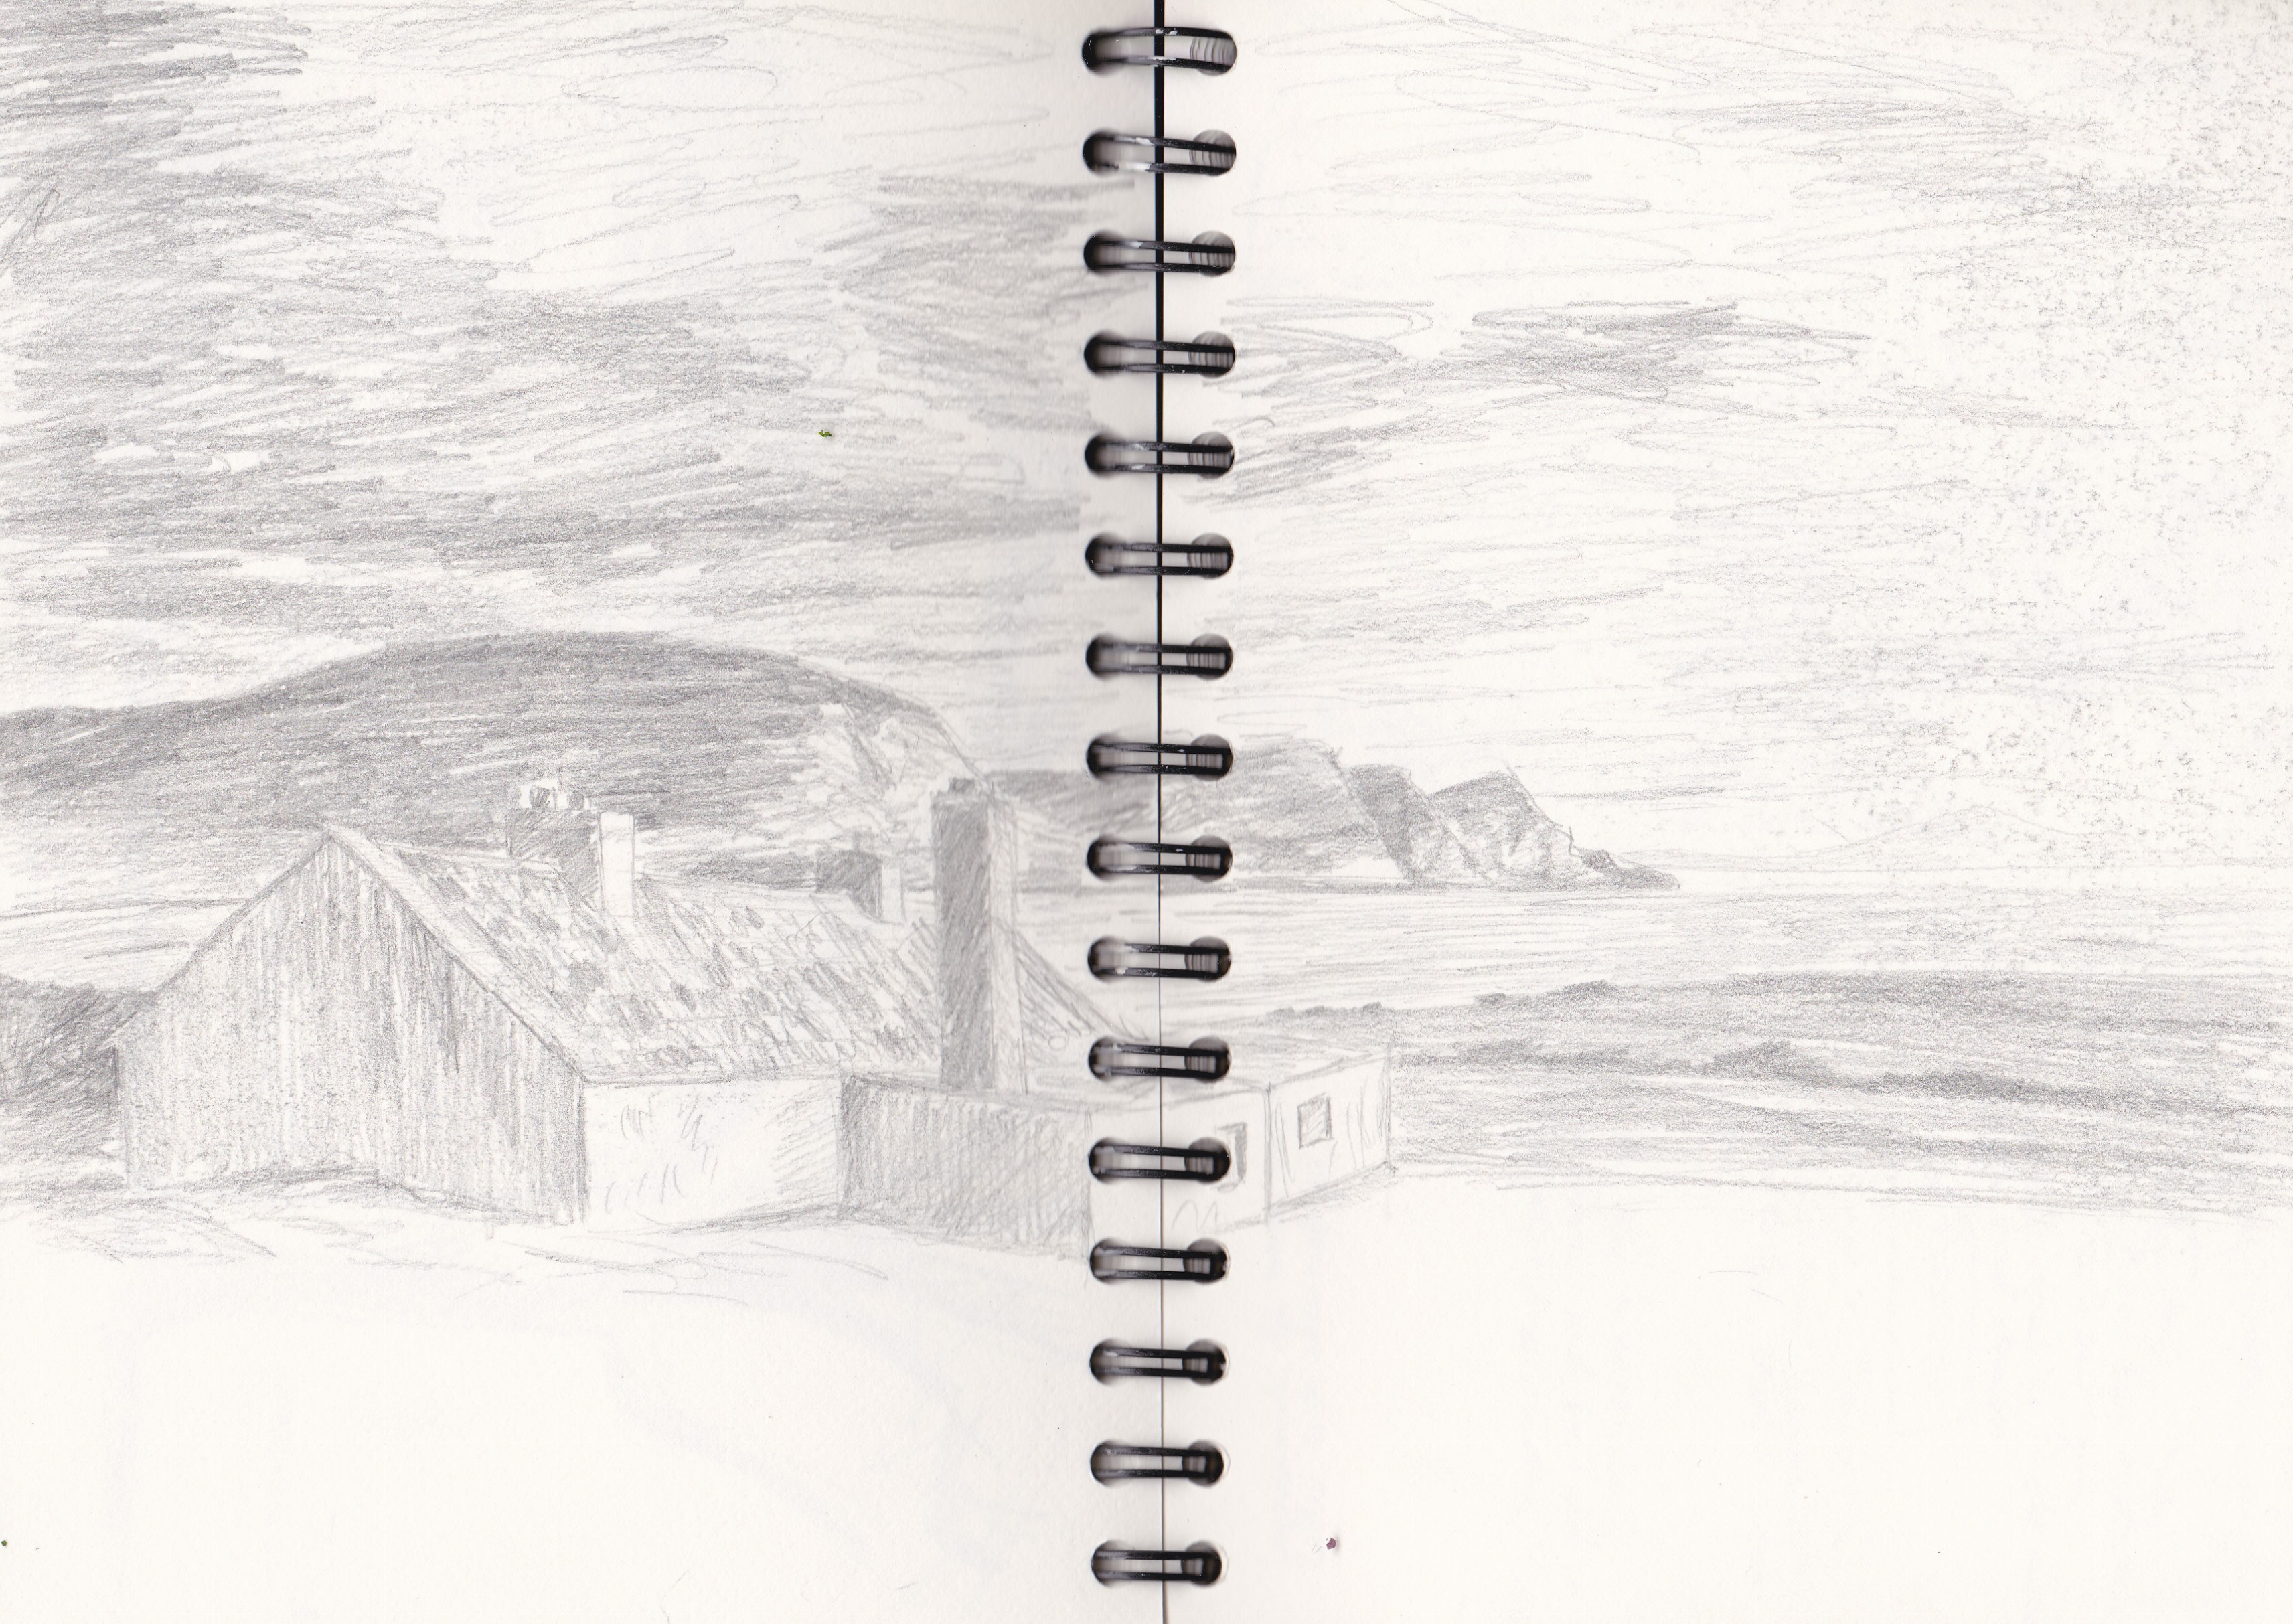 Irische See/ Irish Sea. Bleistiftskizze / pencil sketch. A4.